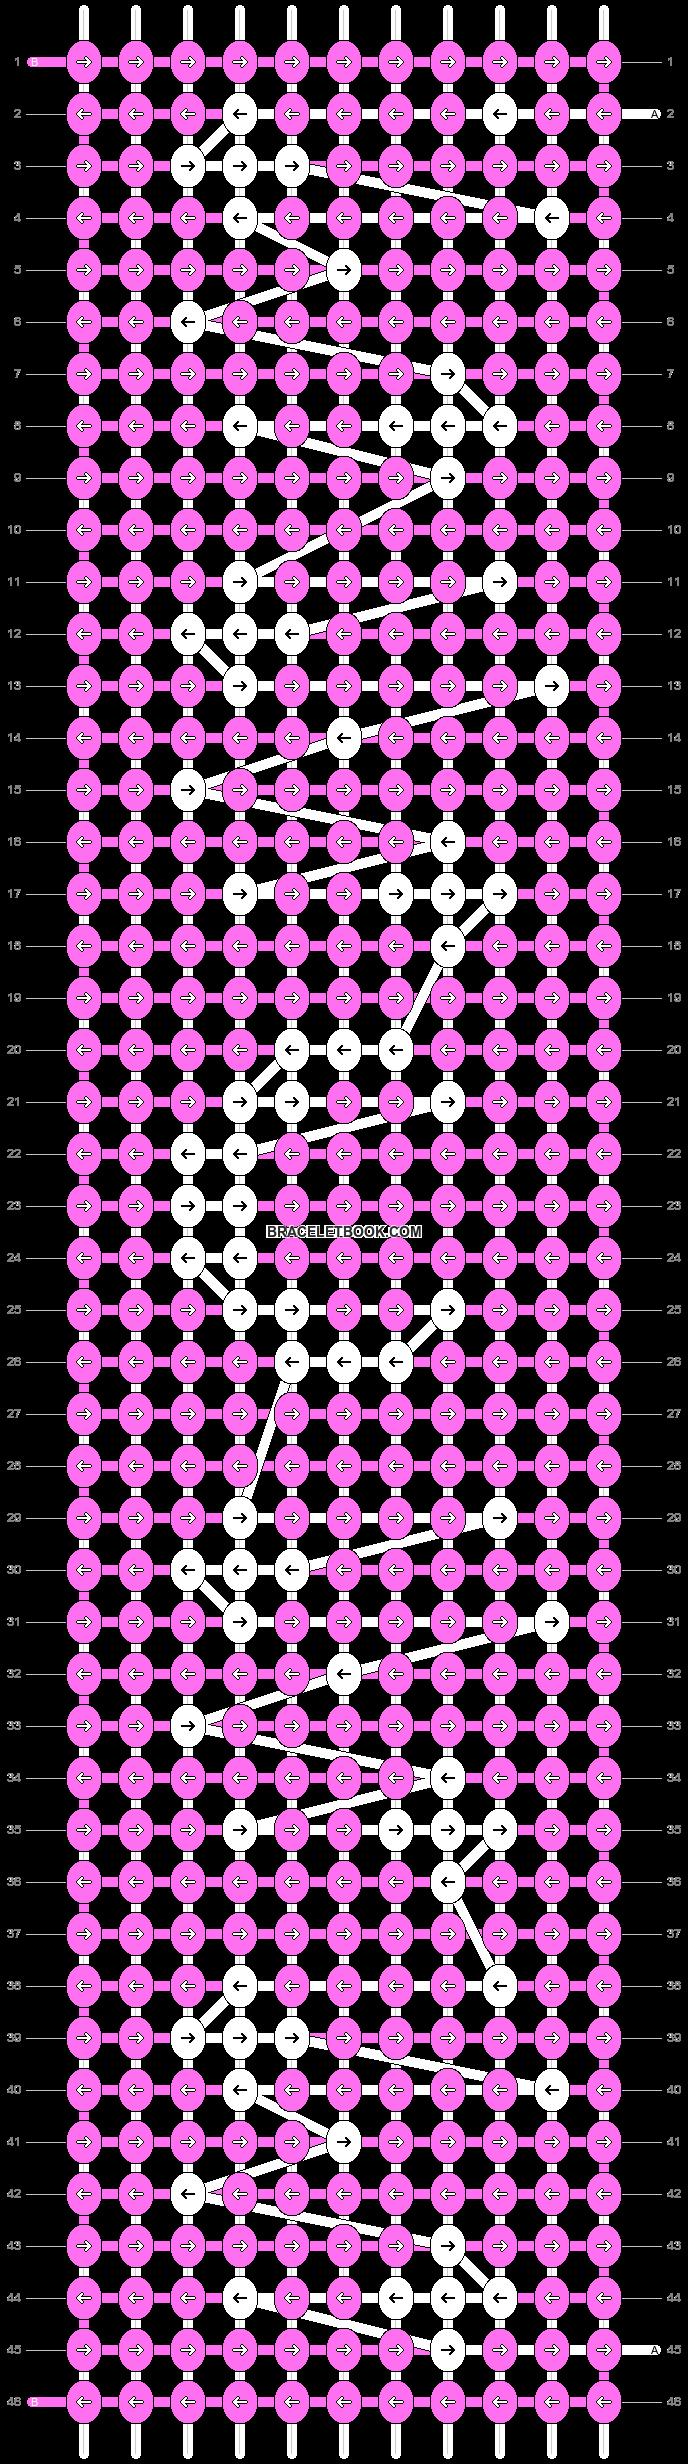 Alpha pattern #97653 variation #179499 pattern